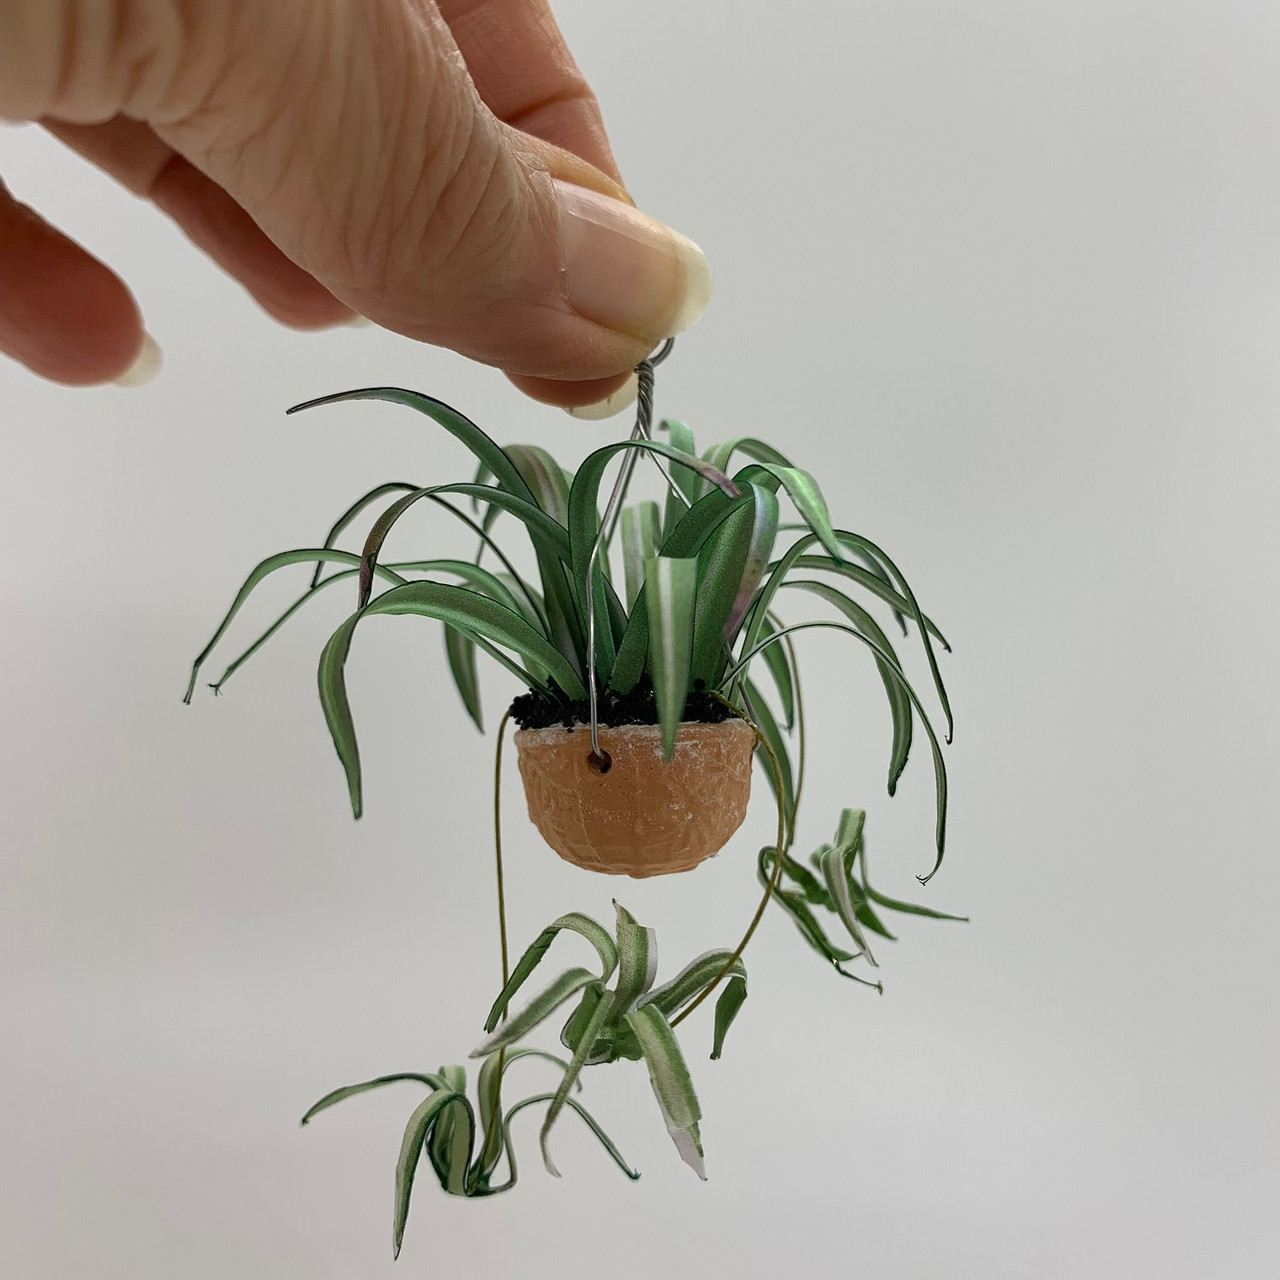 Hanging Spider Plant (UFN1019)